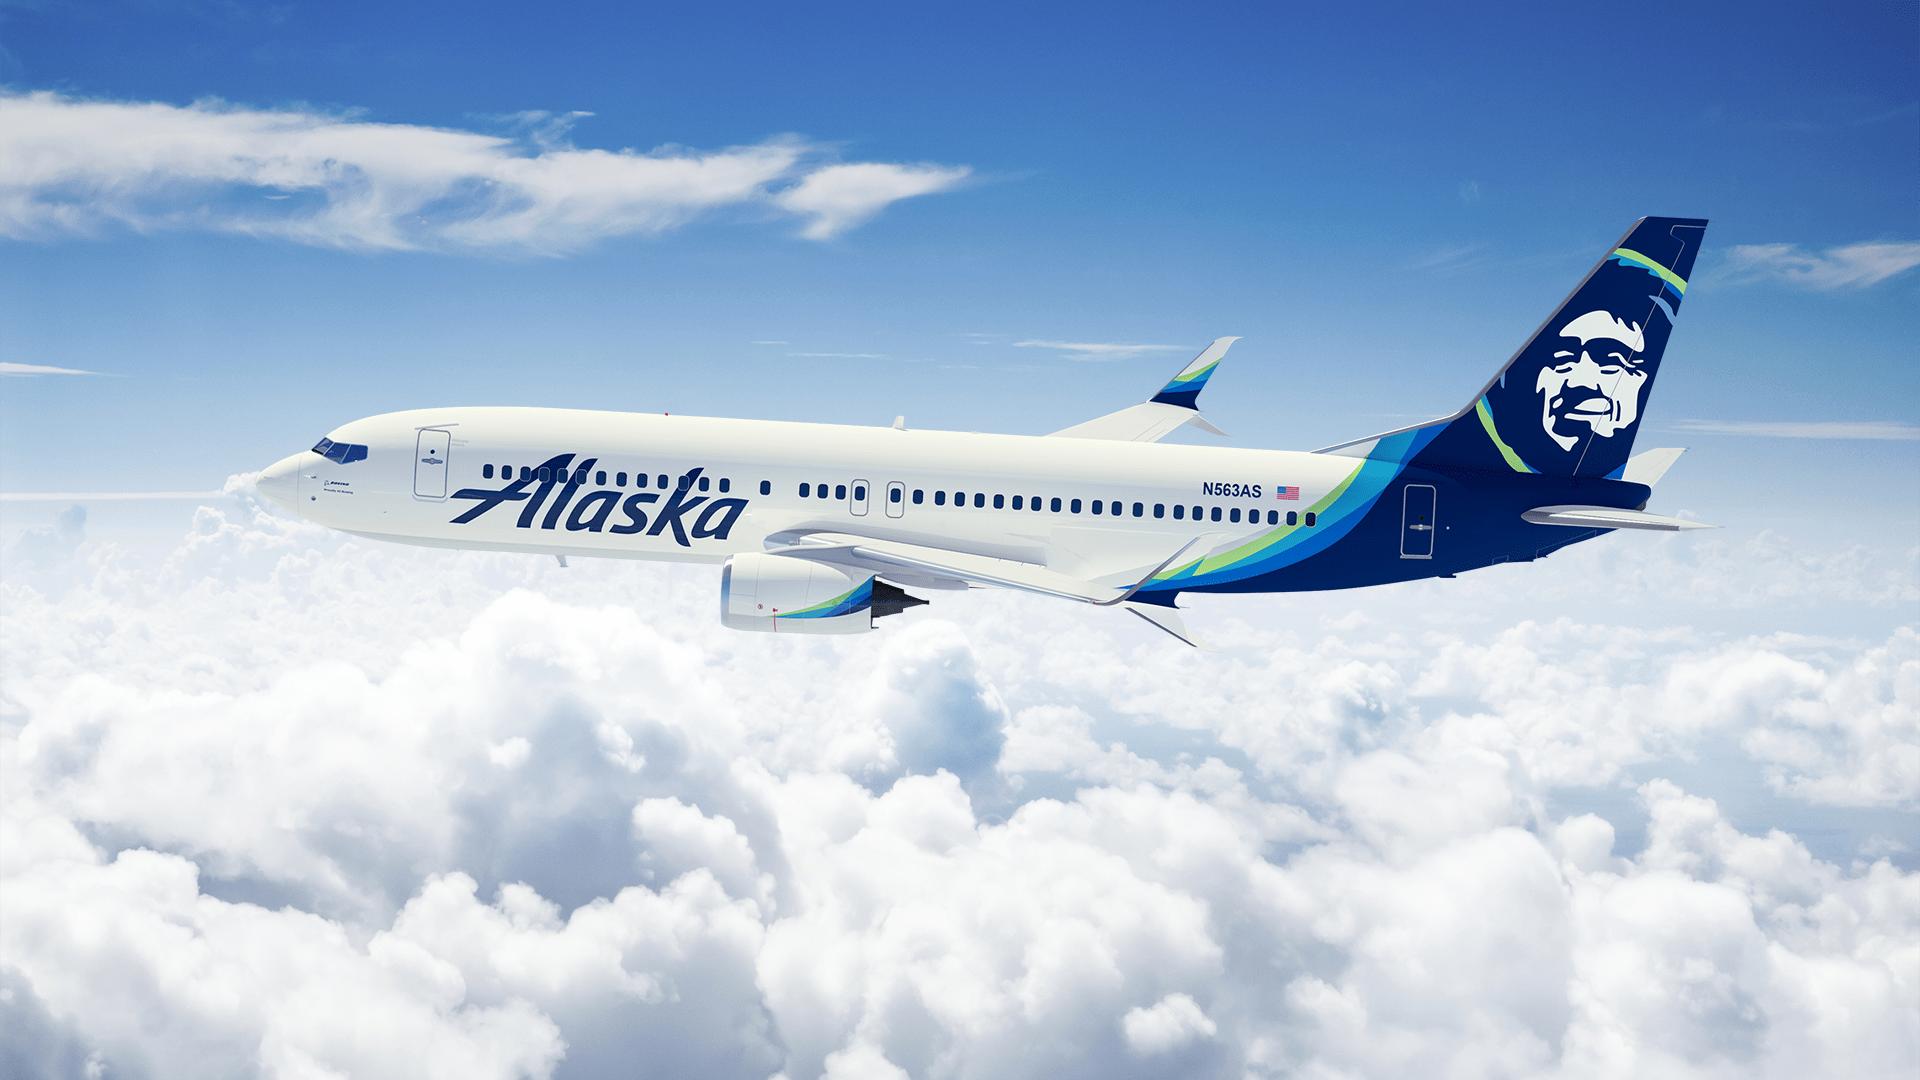 How to Book Alaska flights with Avios